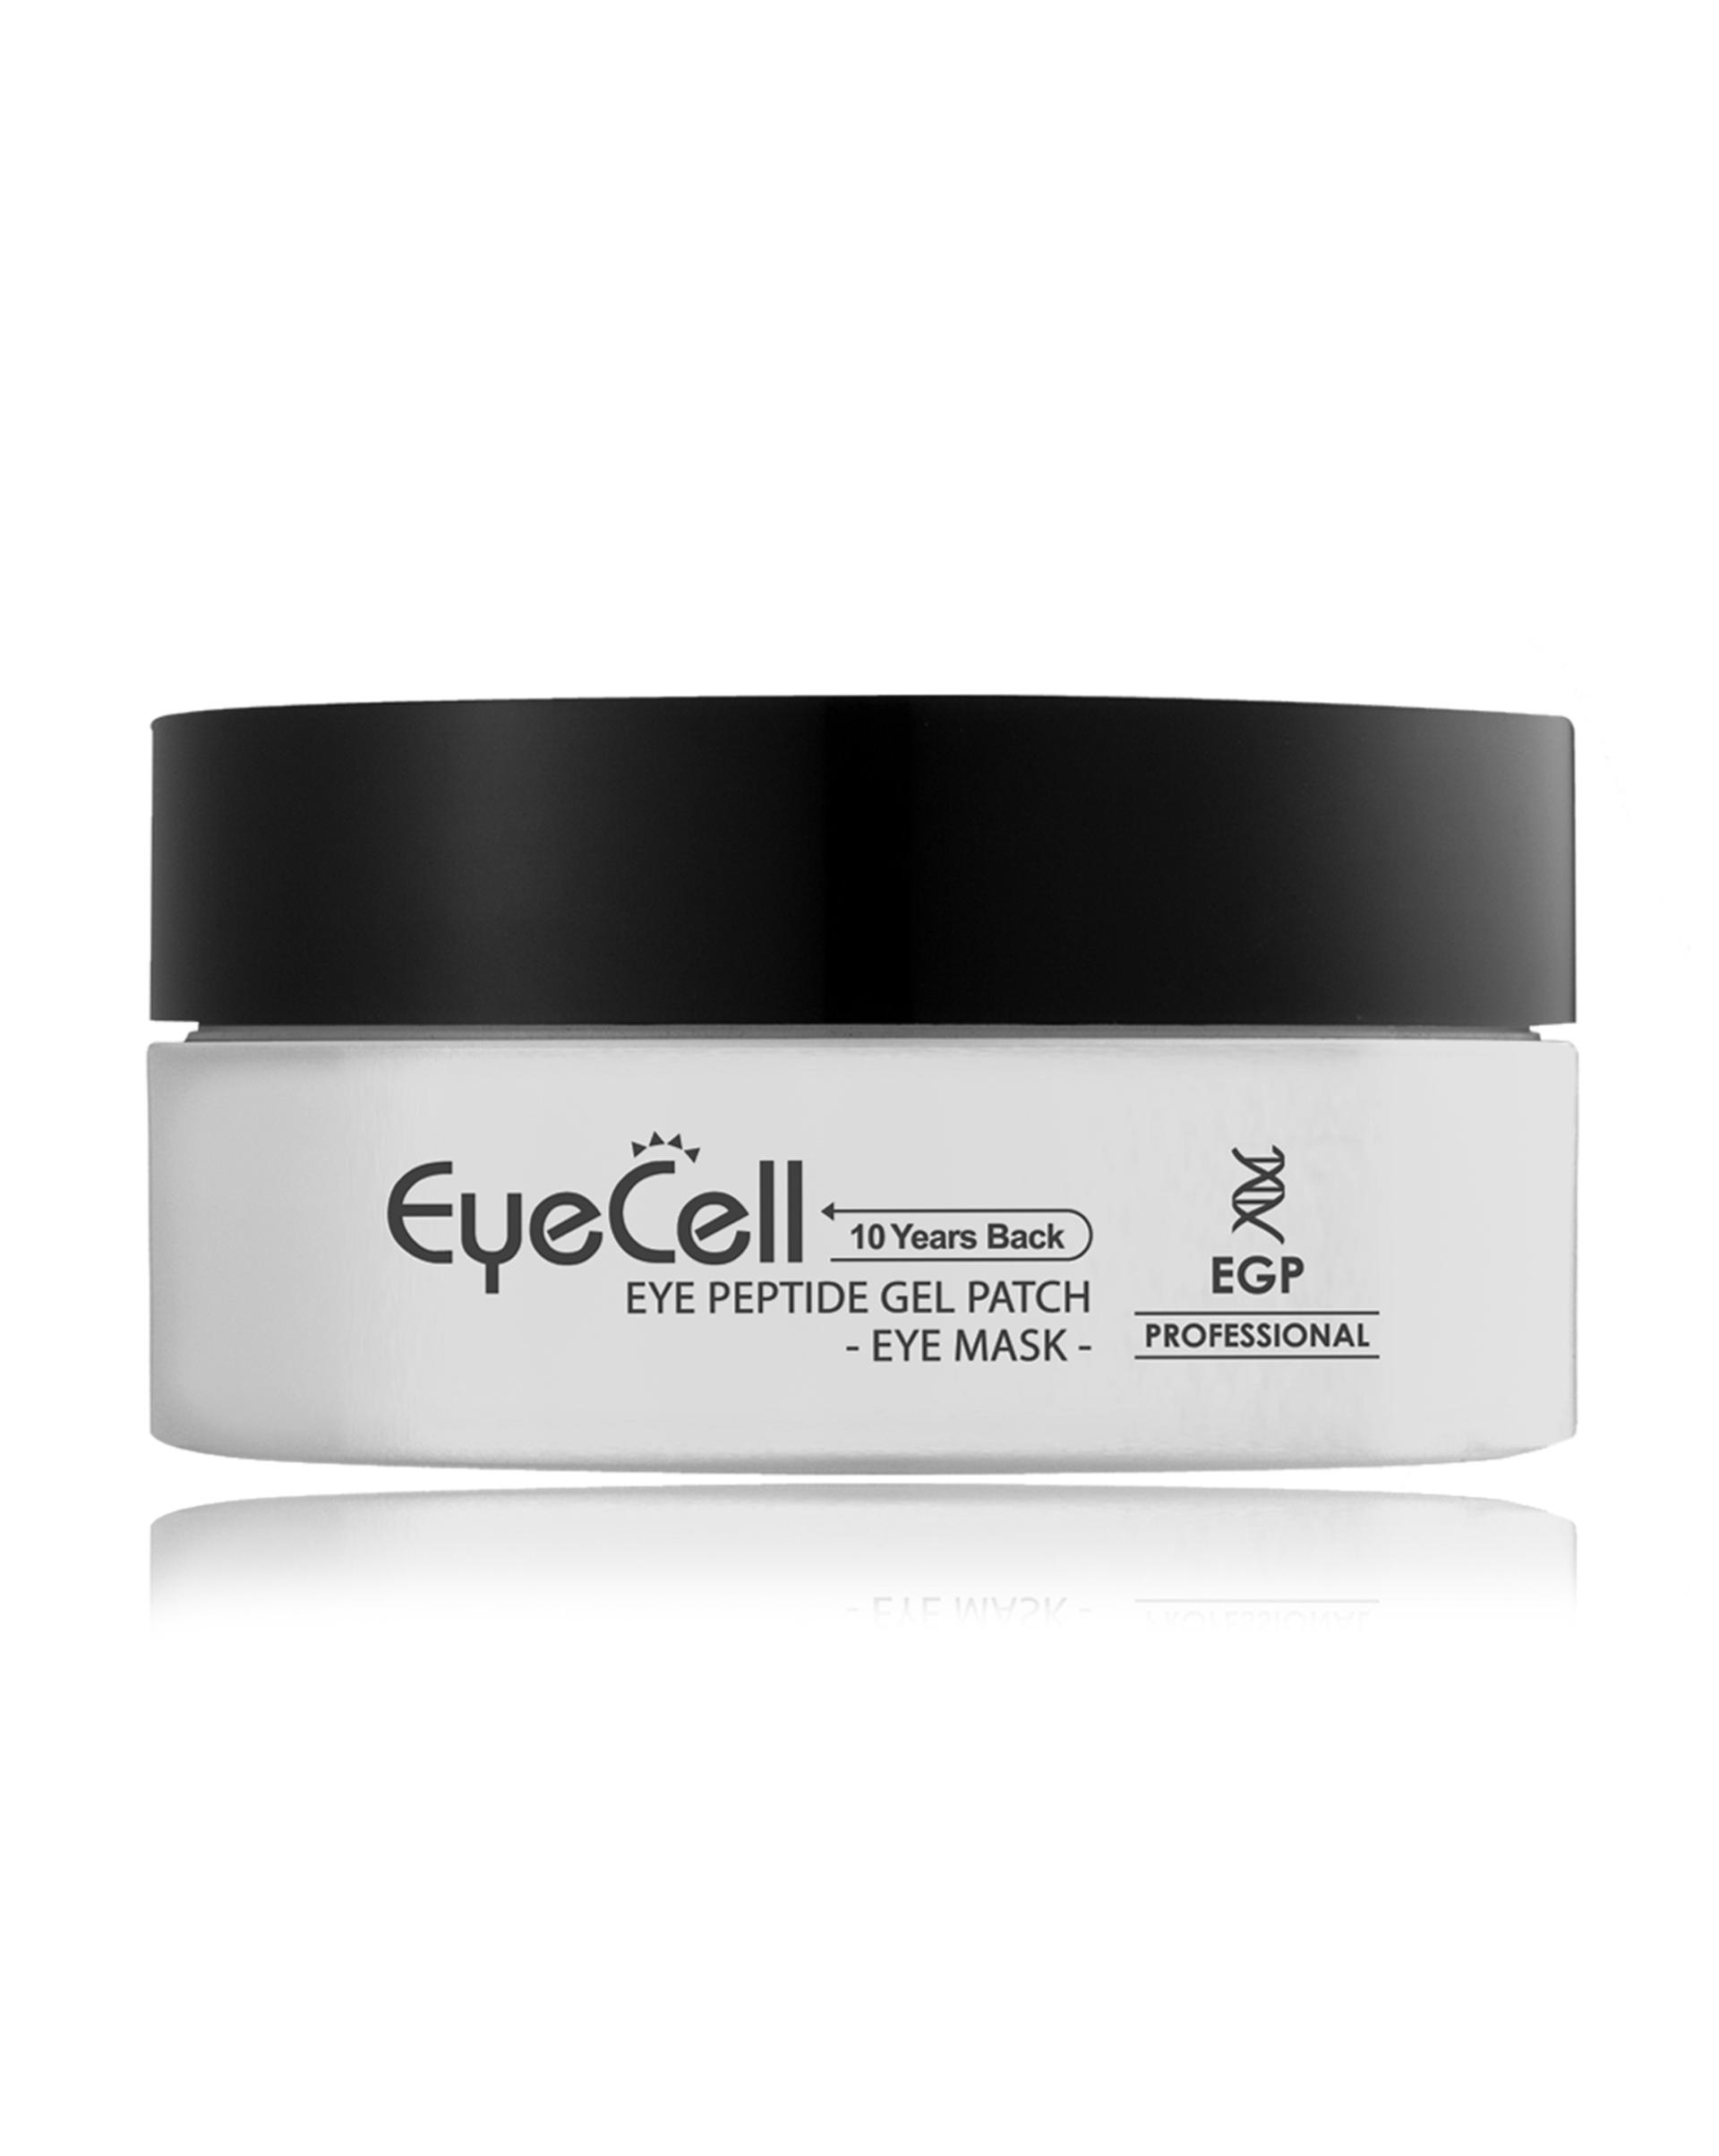 12Storeez GENOSYS EYECELL Eye Peptide Gel Patch Пептидные гелевые патчи для области вокруг глаз, 60 шт